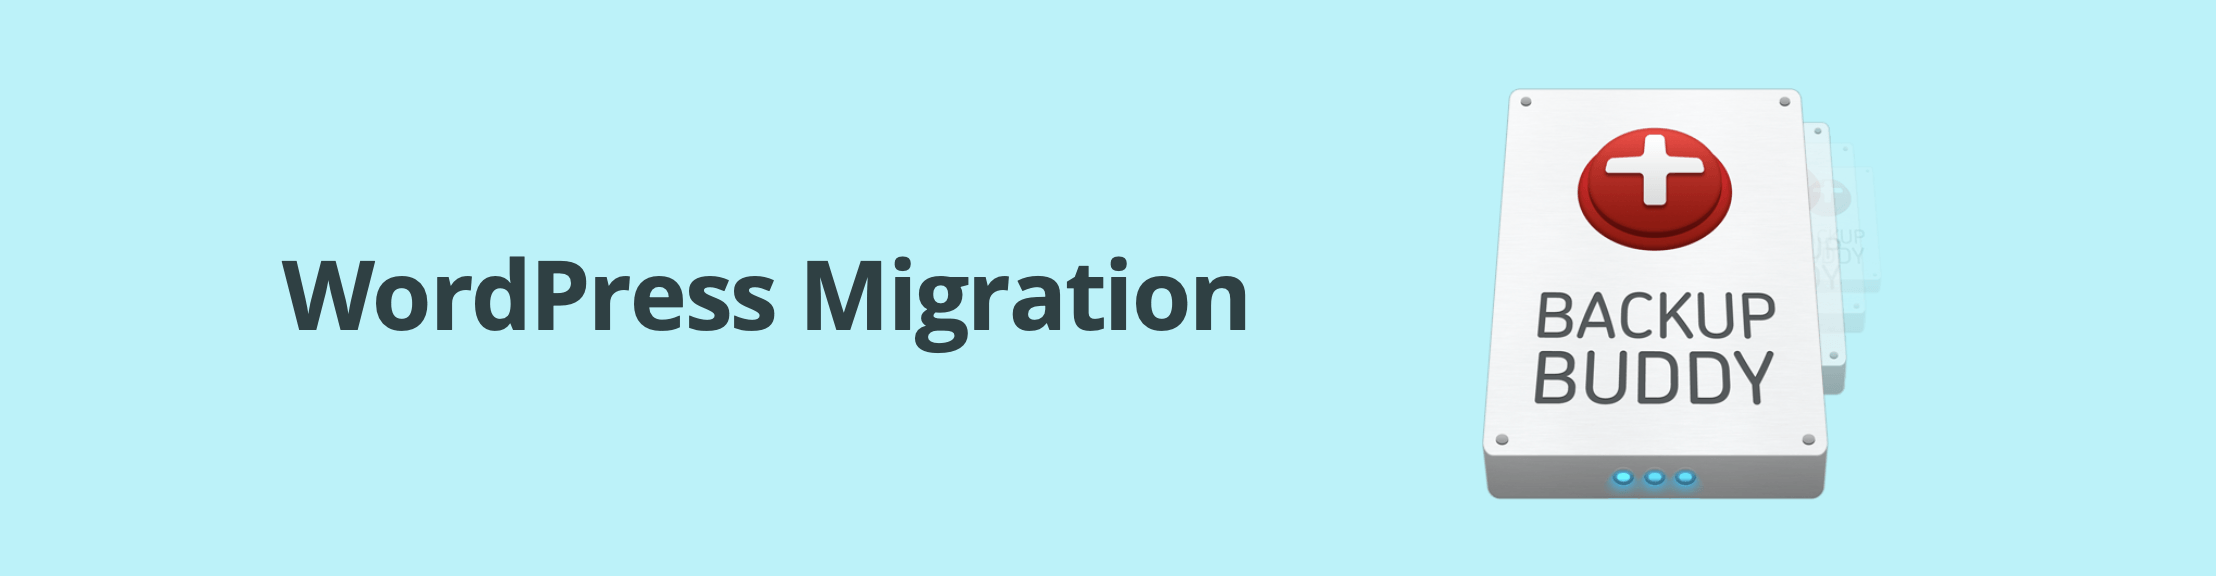 backupbuddy-wordpress-migration